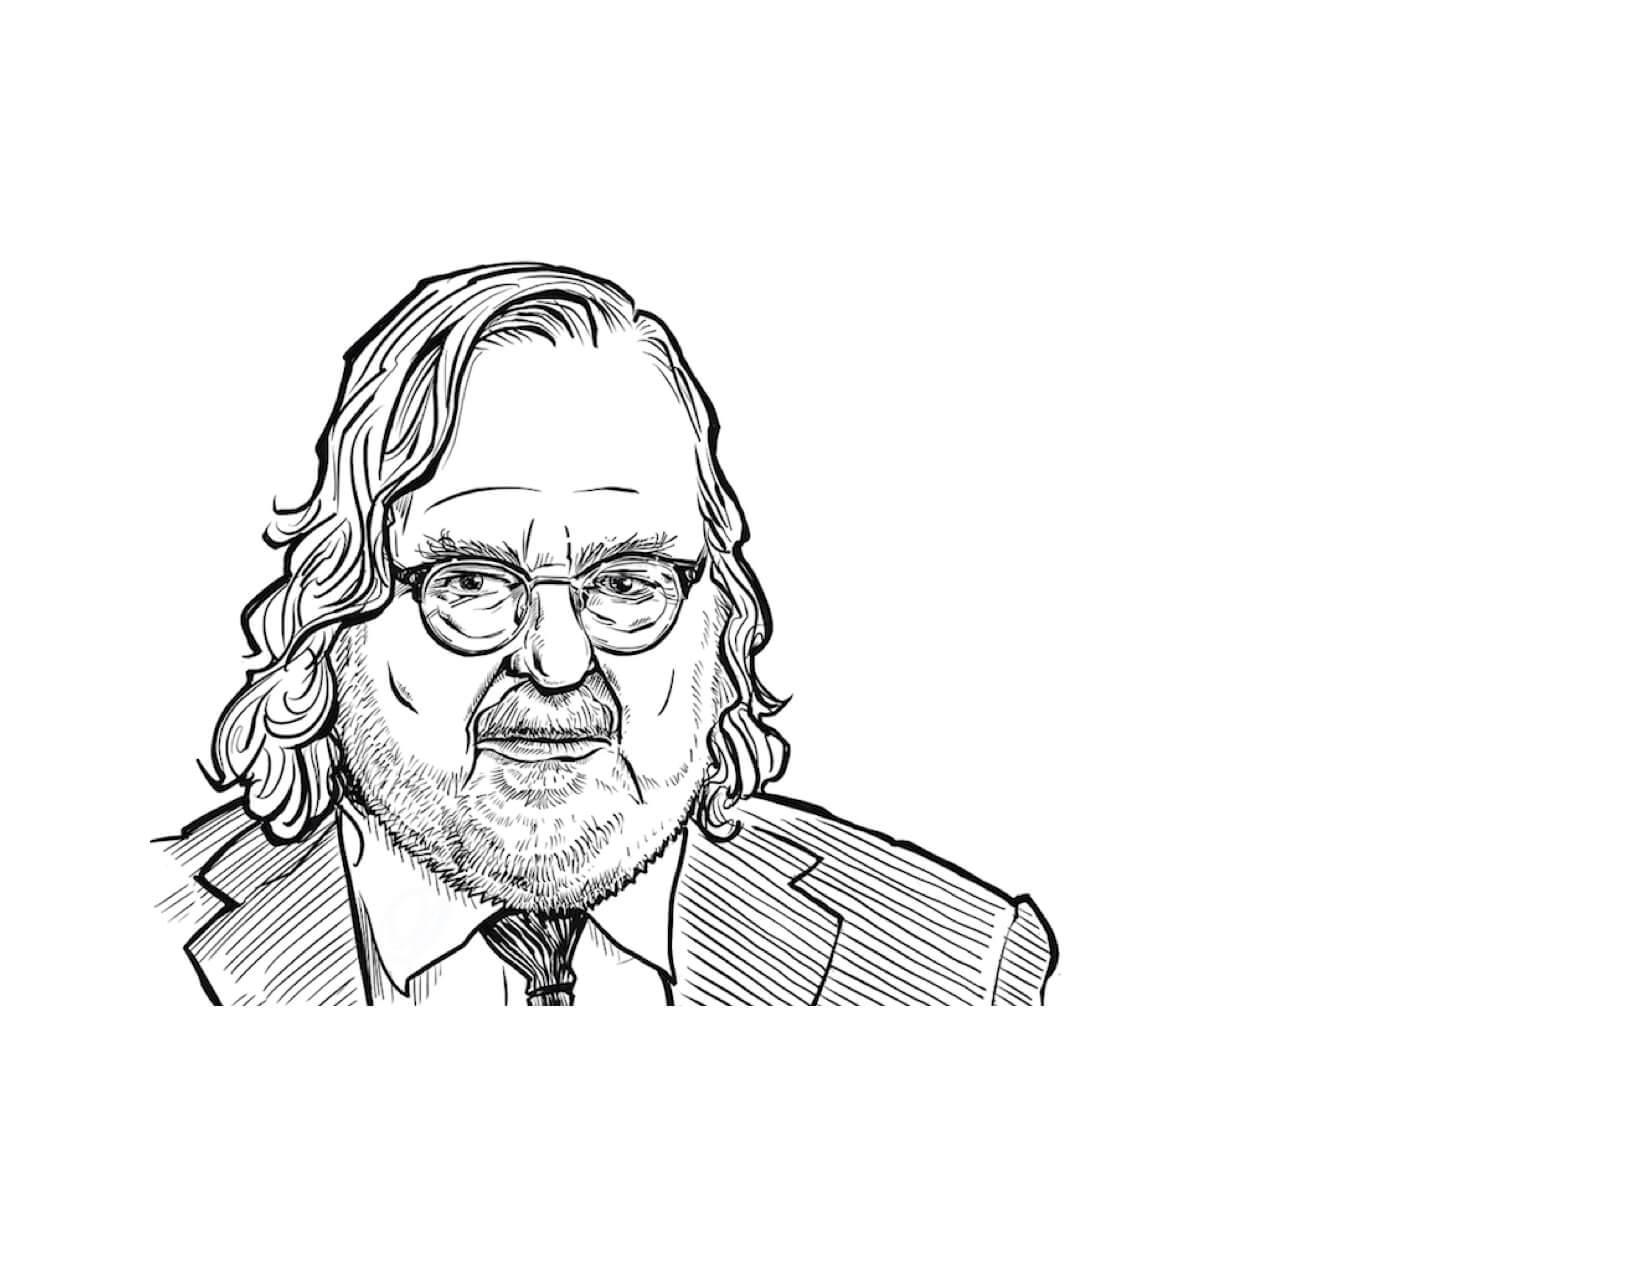 MD Anderson immunologist and 2018 Nobel laureate James P. Allison, Ph.D. (Original drawing by Ken Ellis)